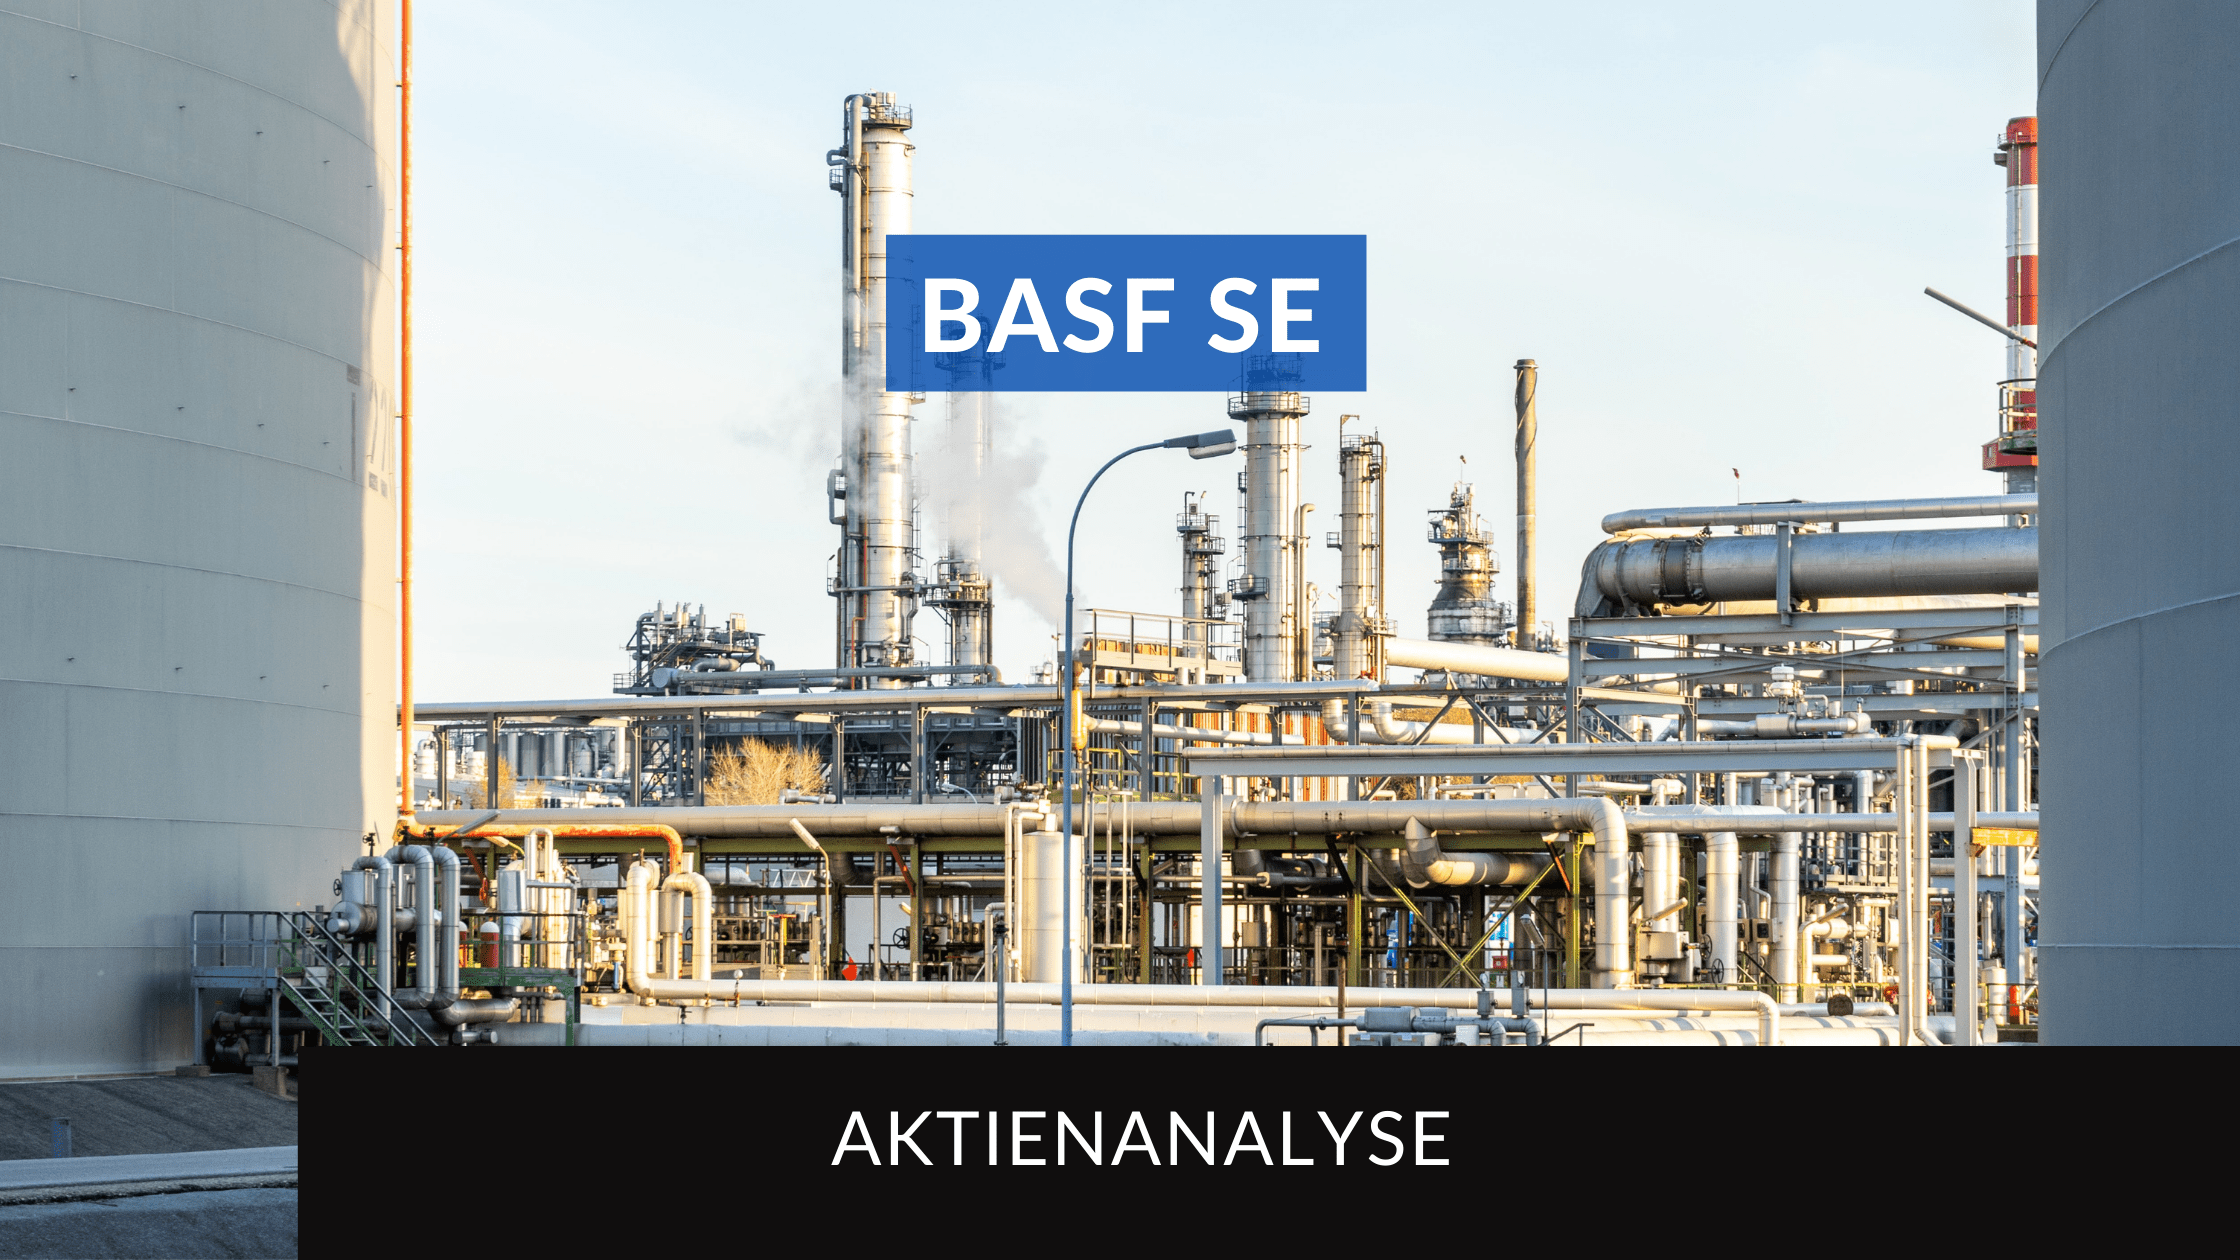 BASF SE Aktienanalyse